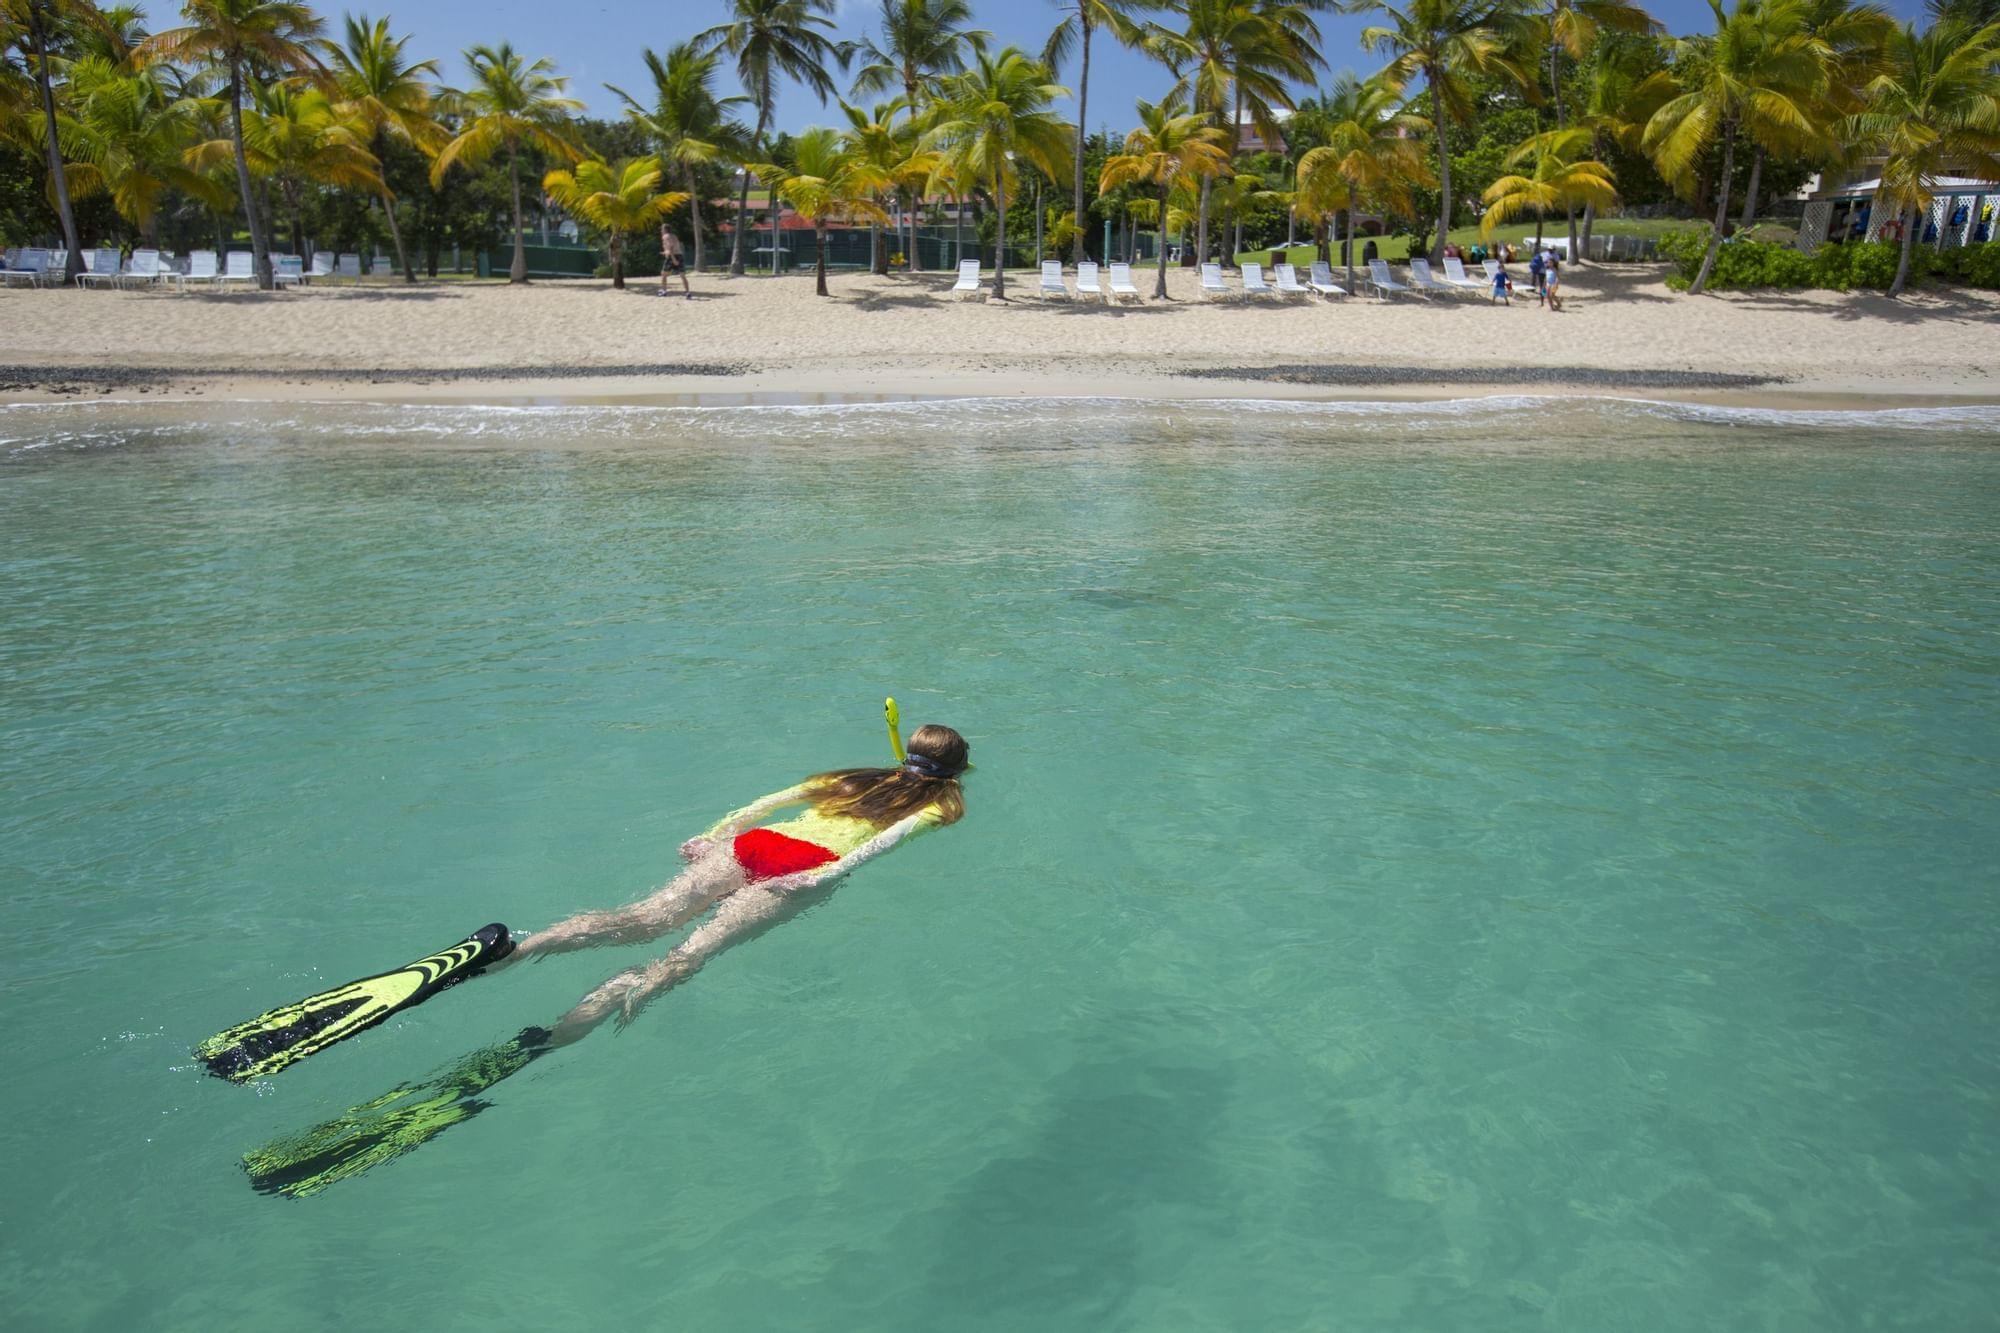 Woman snorkeling near the beach